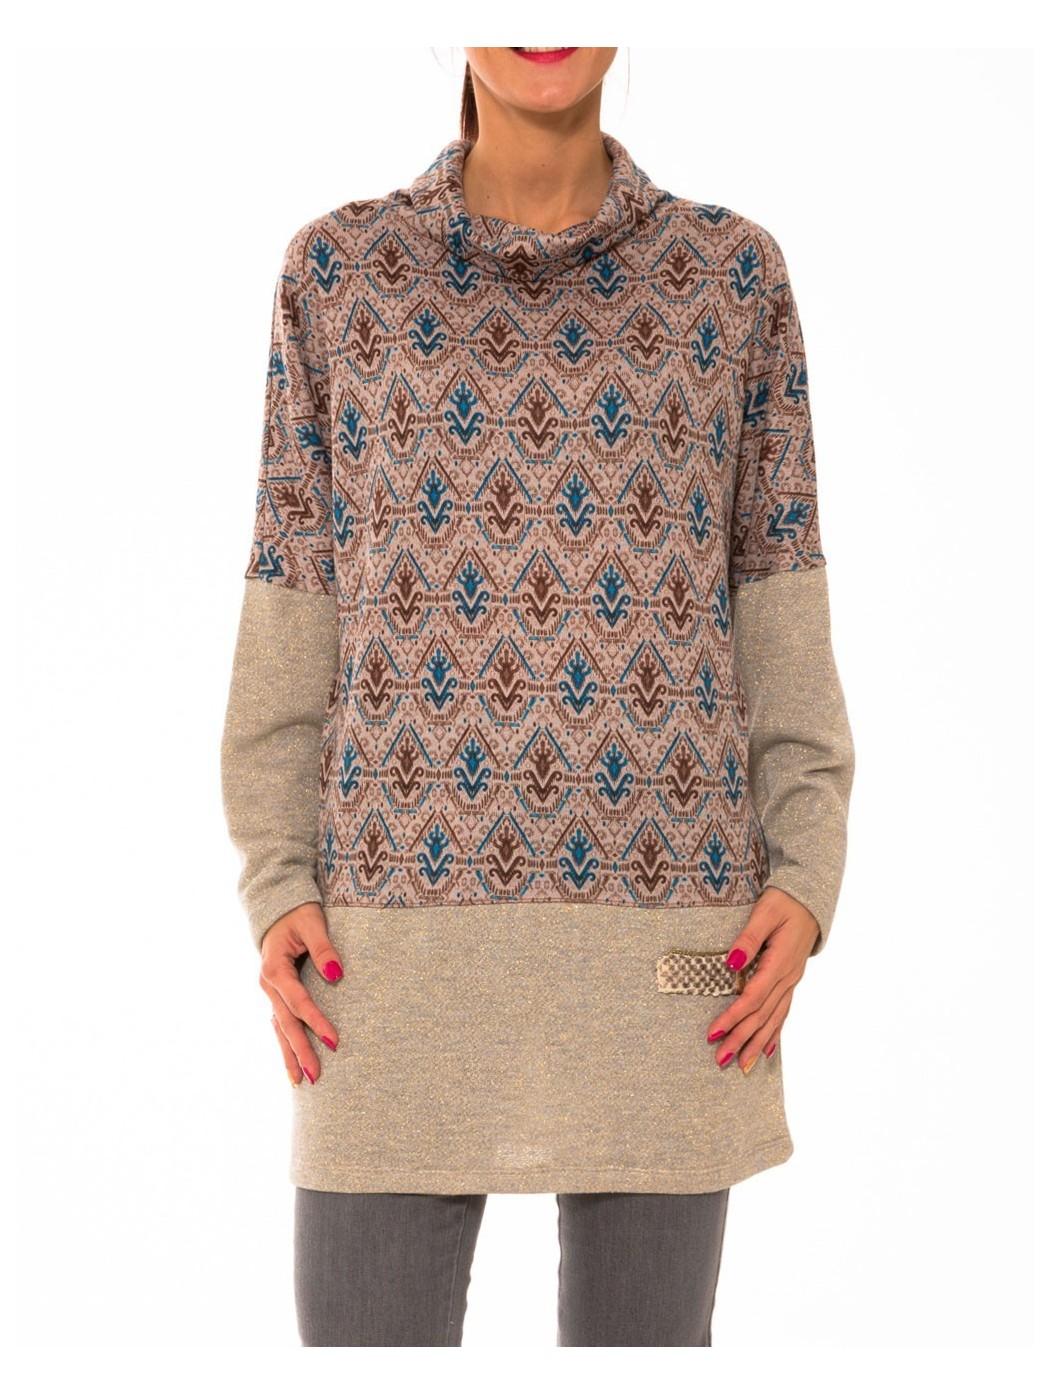 Paz Torras blouse